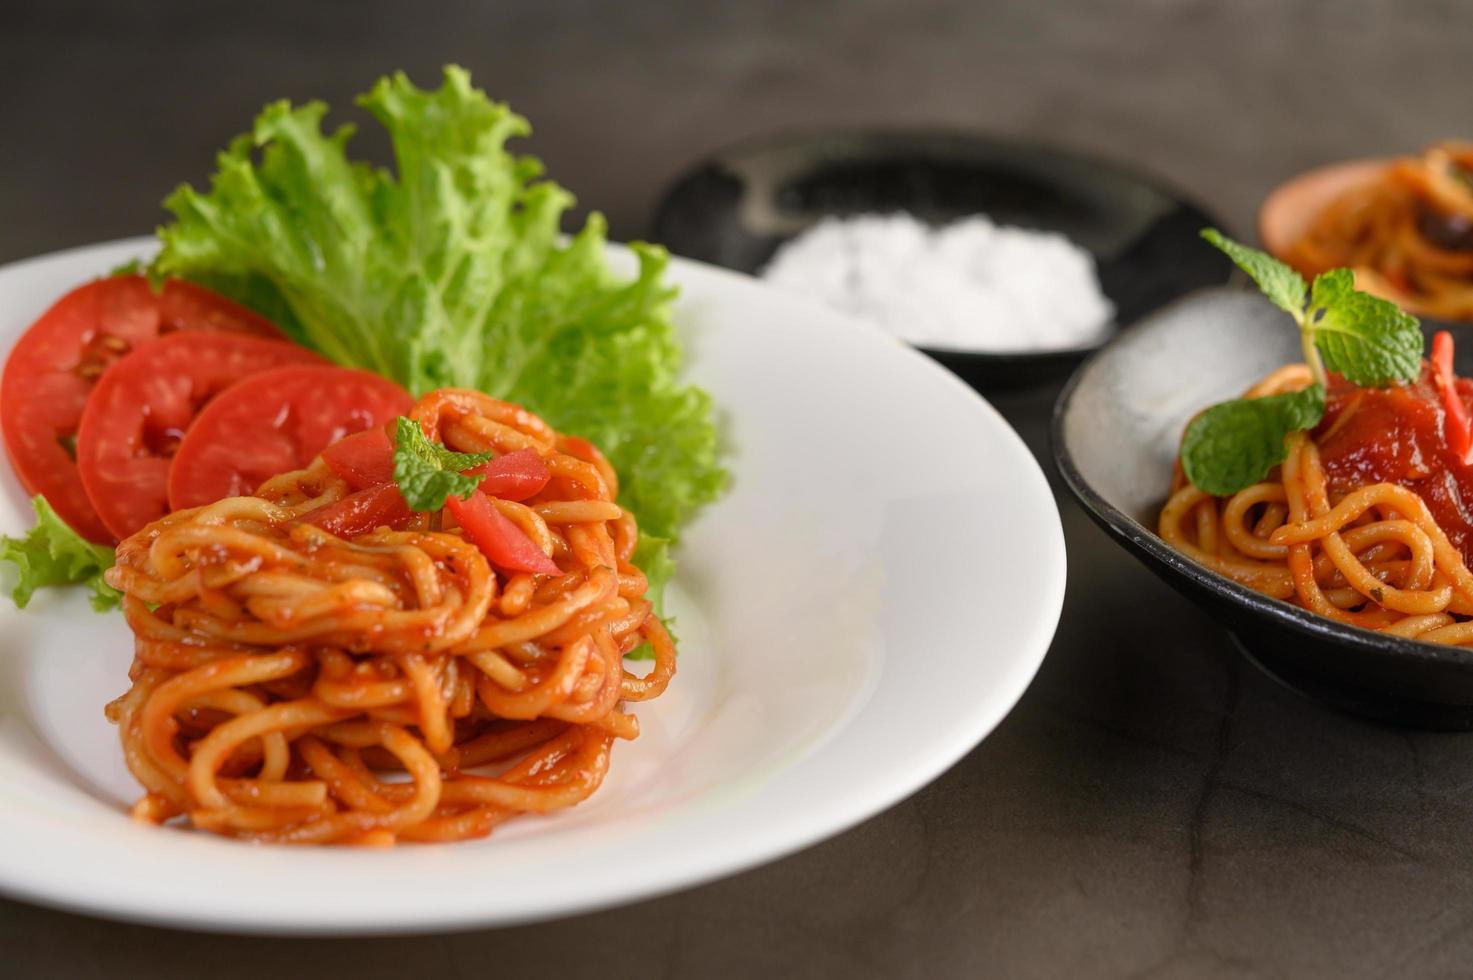 pasta italiana de espagueti con salsa de tomate foto